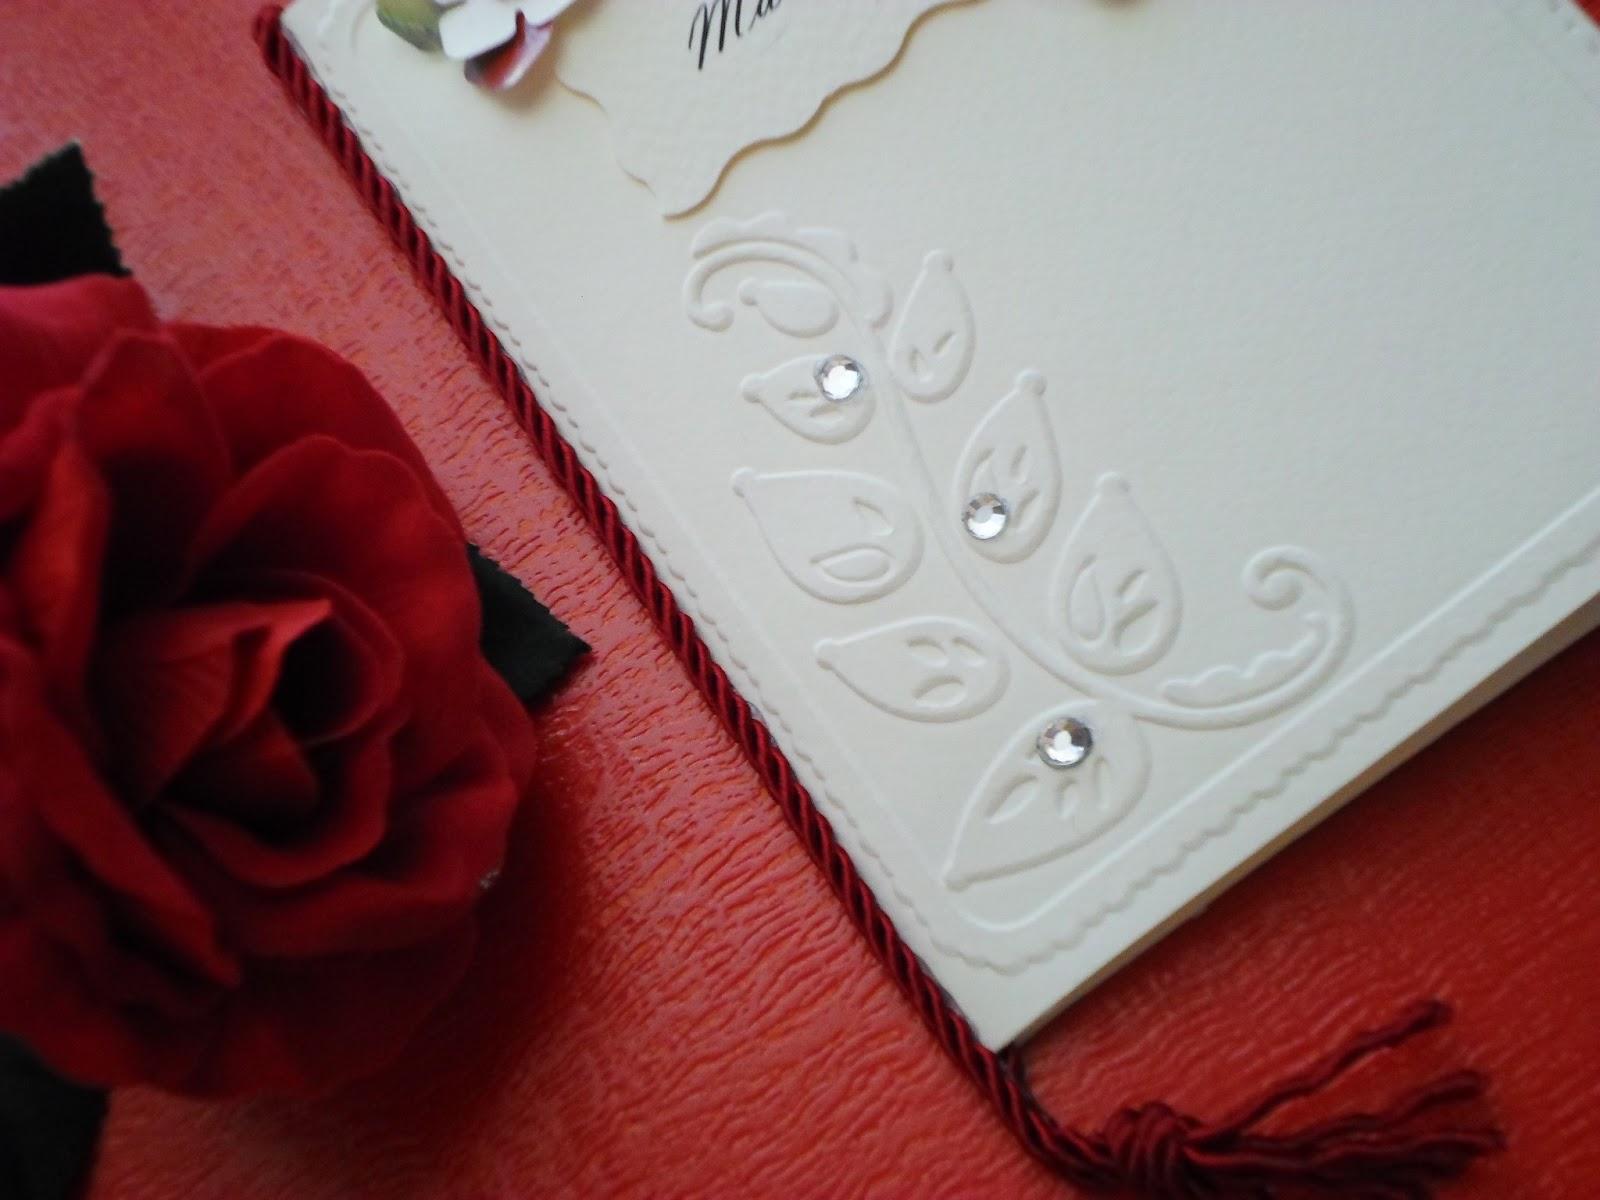 Auguri Matrimonio Zen : Preziose raffinatezze biglietto auguri matrimonio fai da te